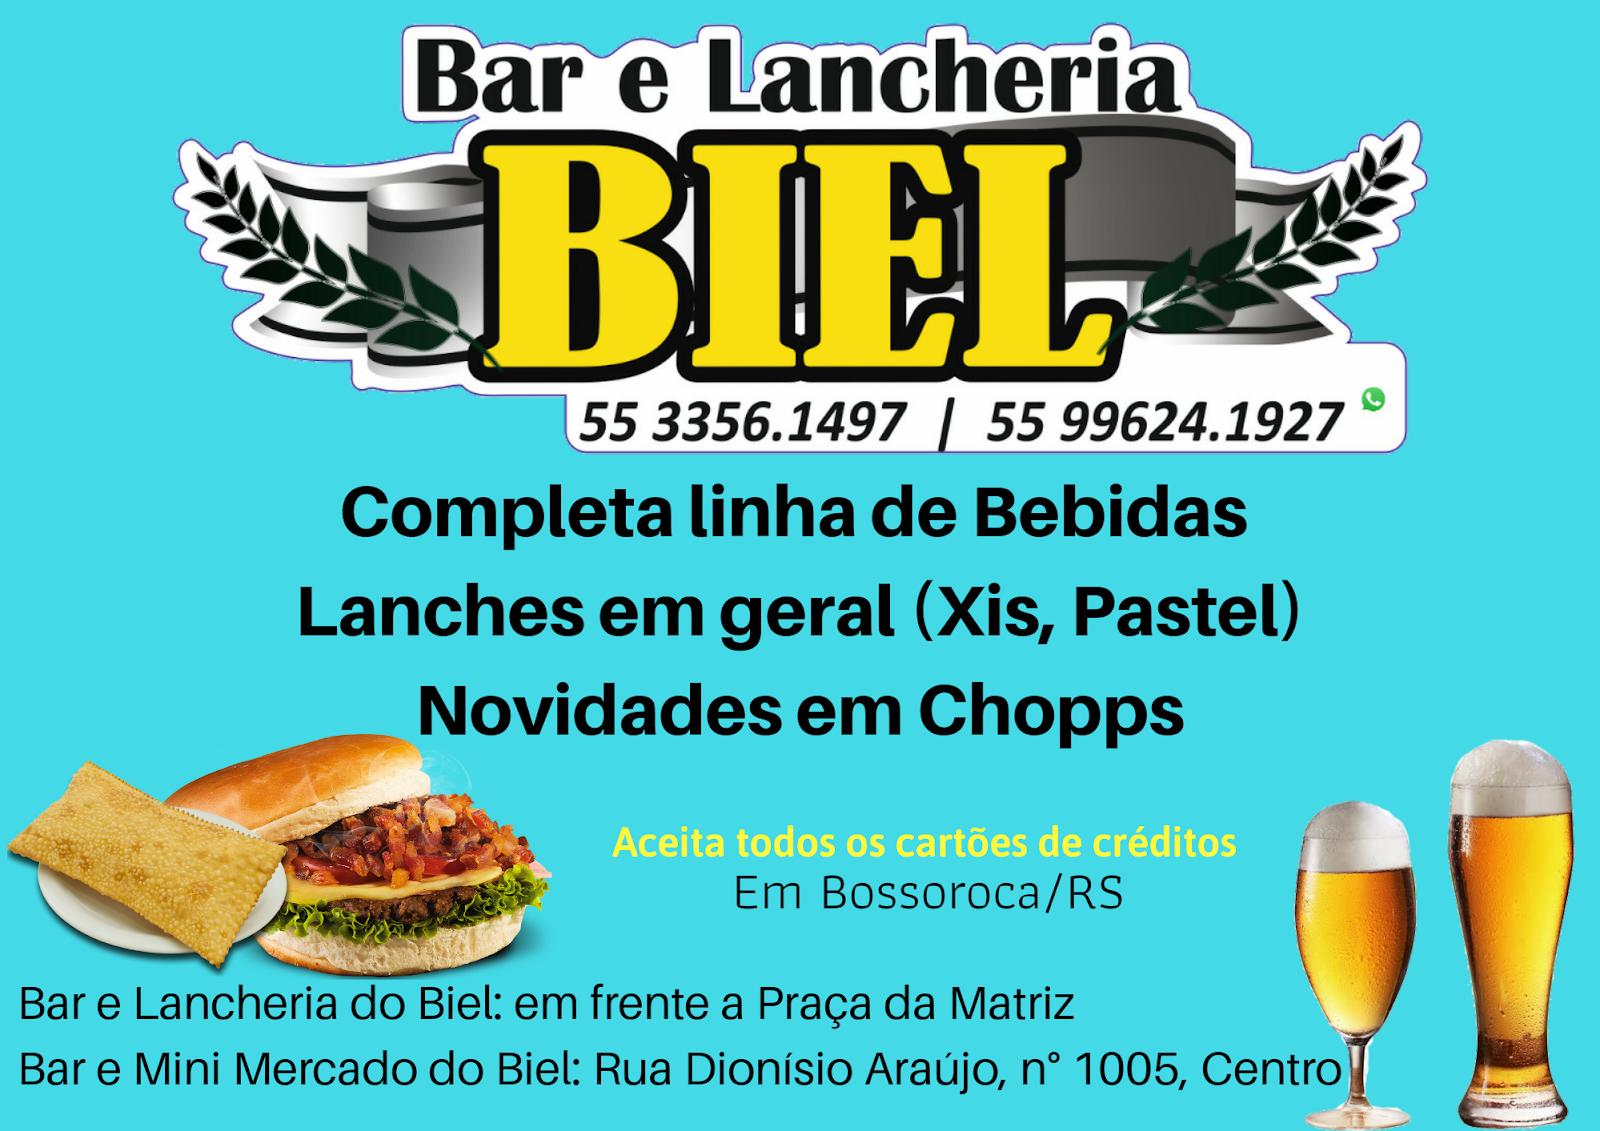 Bar e Lancheria Biel